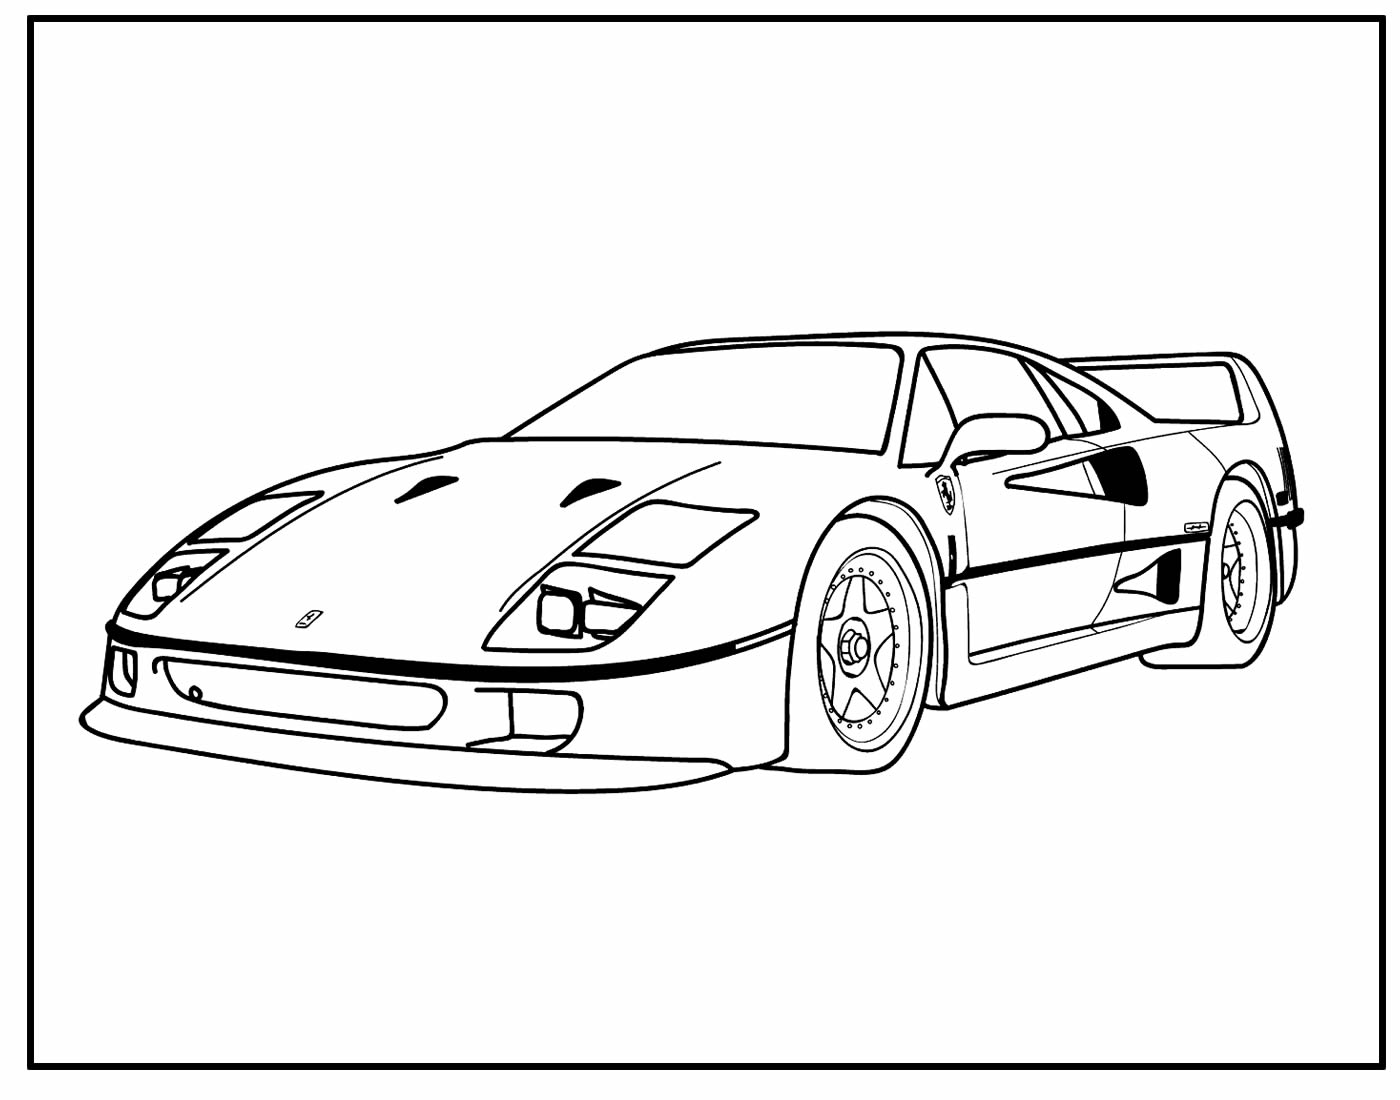 Desenho de Carro para colorir e pintar